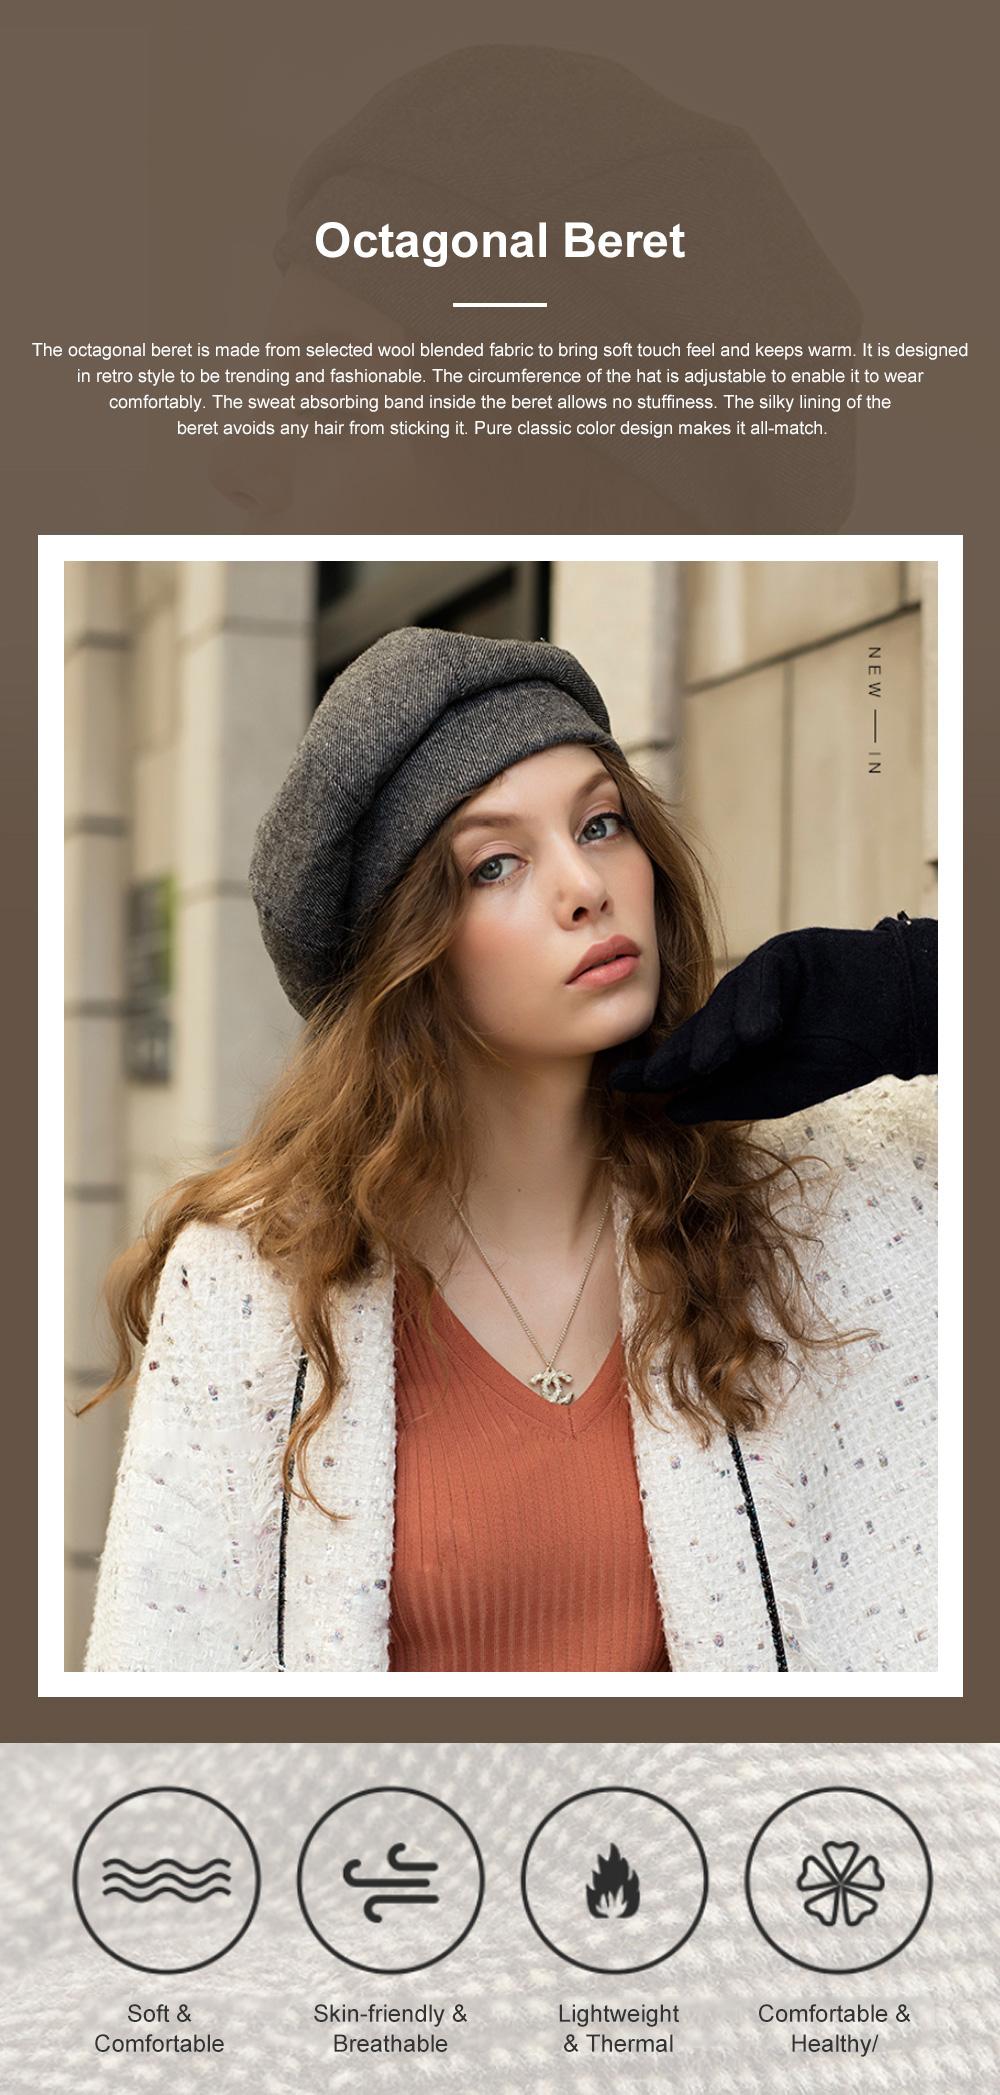 Retro Octagonal Beret for Travelling Breathable Woolen Pumpkin Hat Adjustable Head Circumference Top Hat Green Beret 0